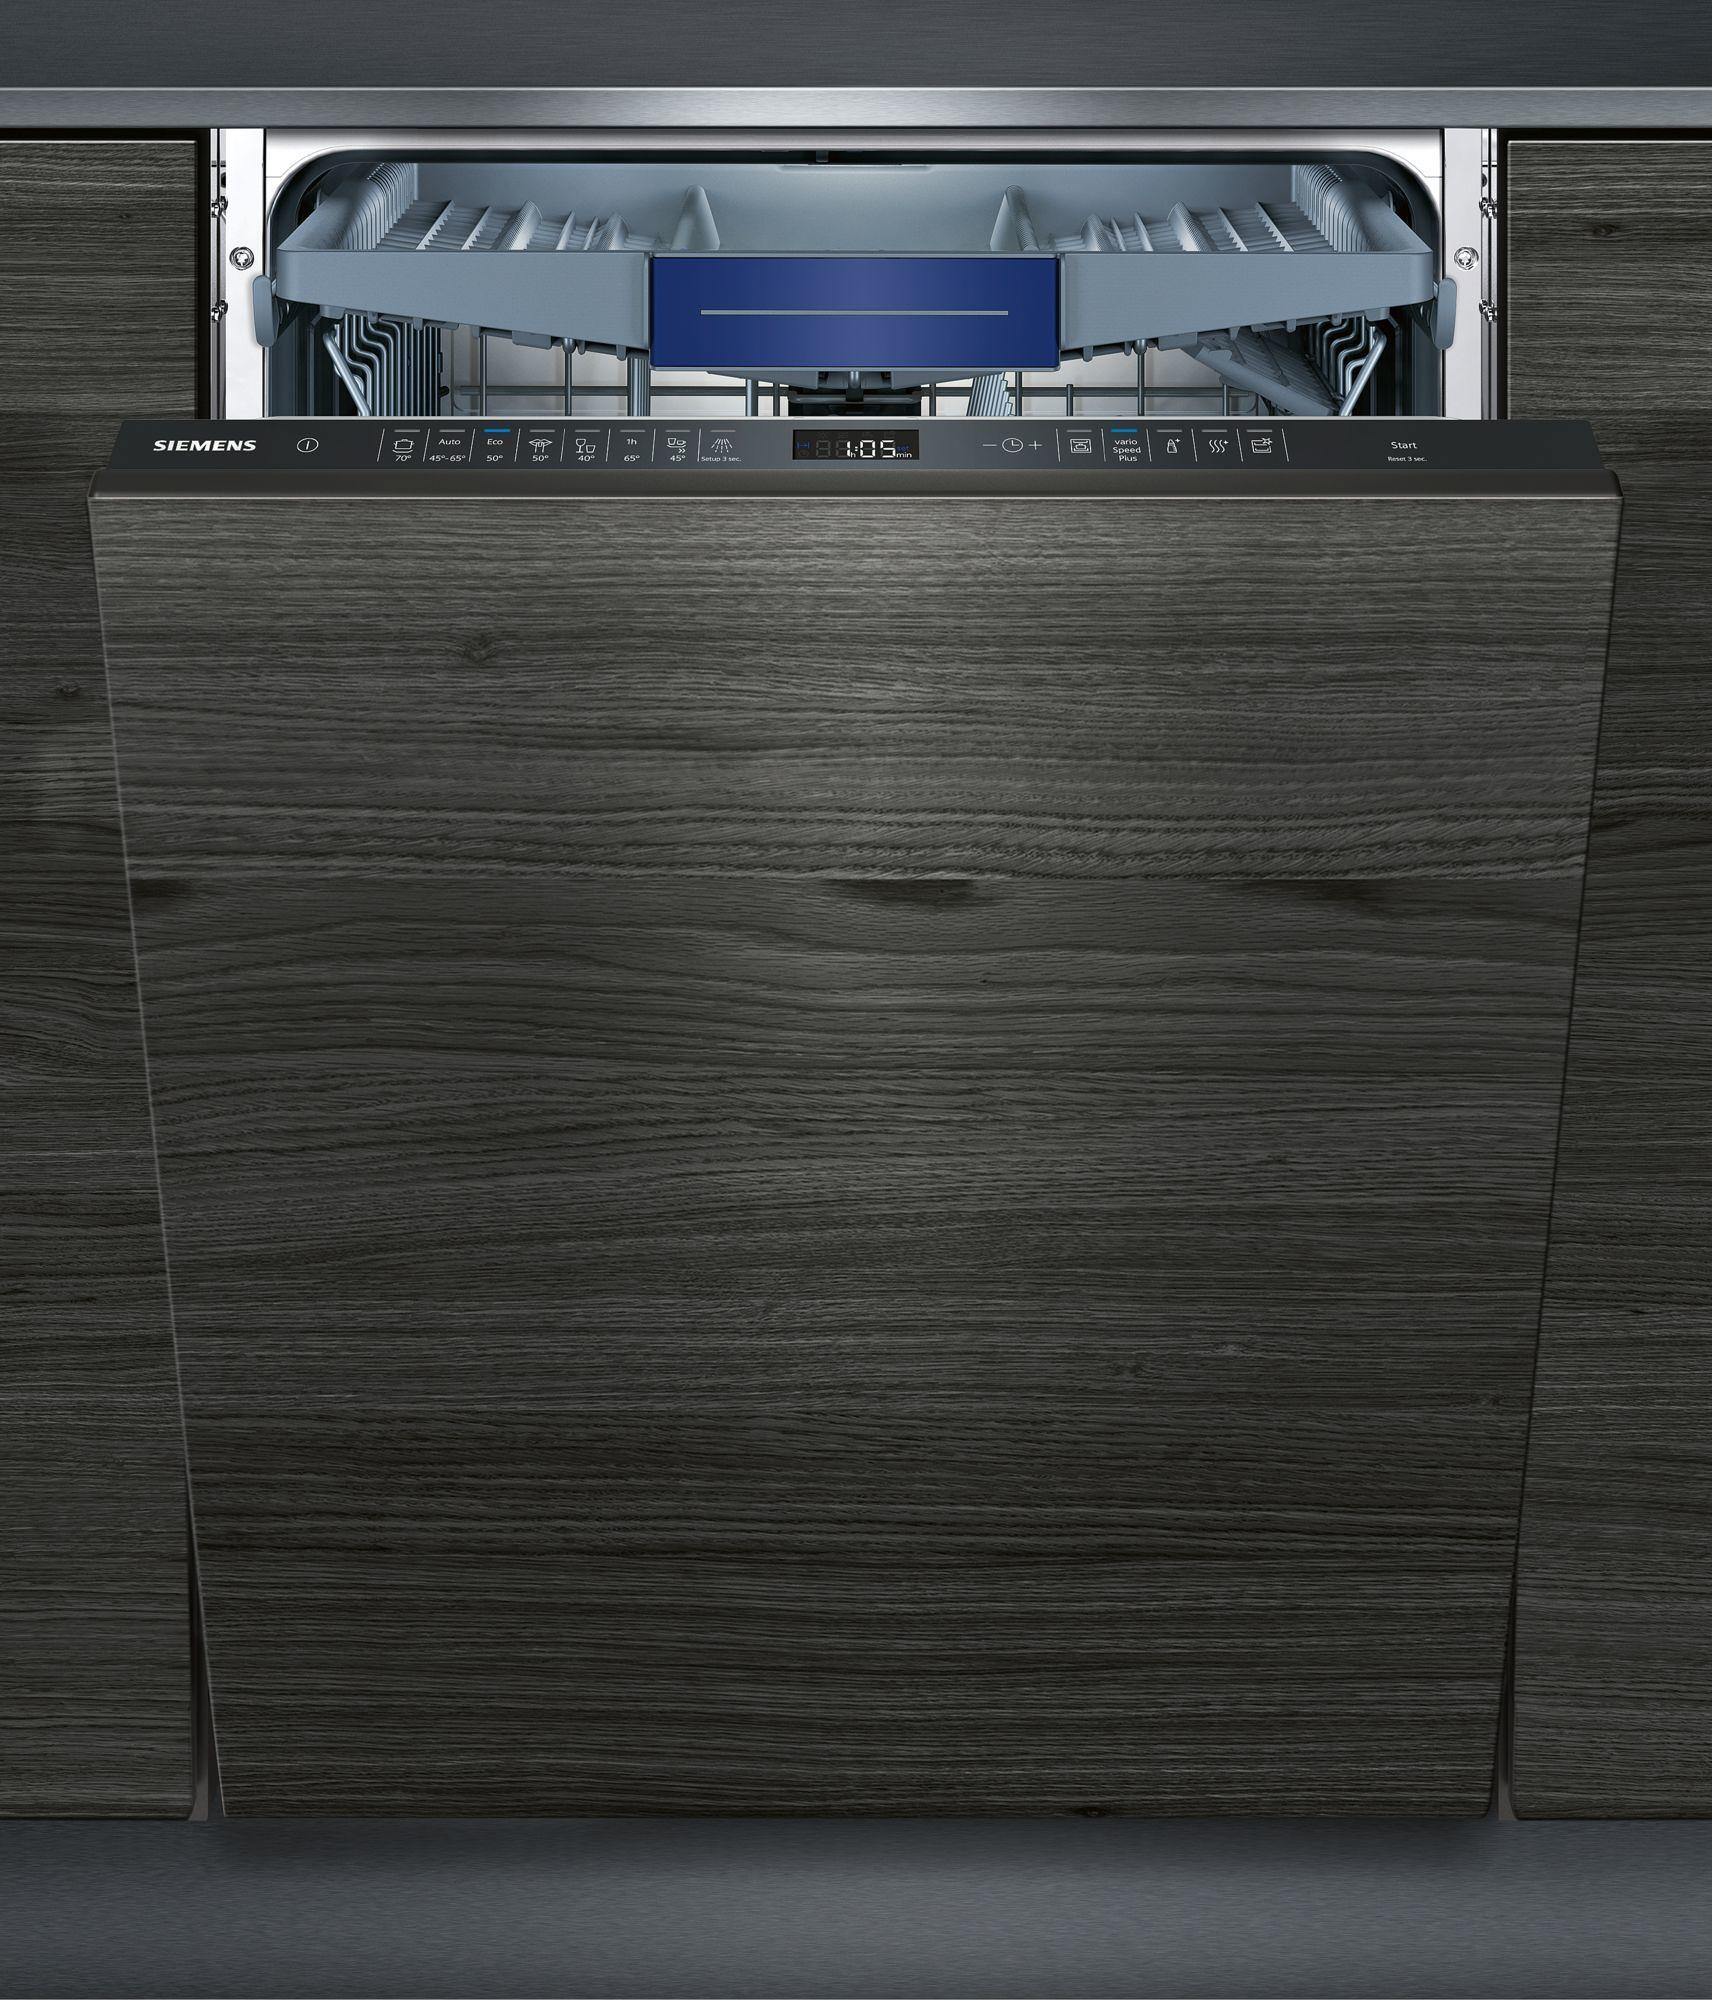 siemens sx658d02me a vollintegrierbarer einbau geschirrsp ler 60cm breit braun varioflex. Black Bedroom Furniture Sets. Home Design Ideas